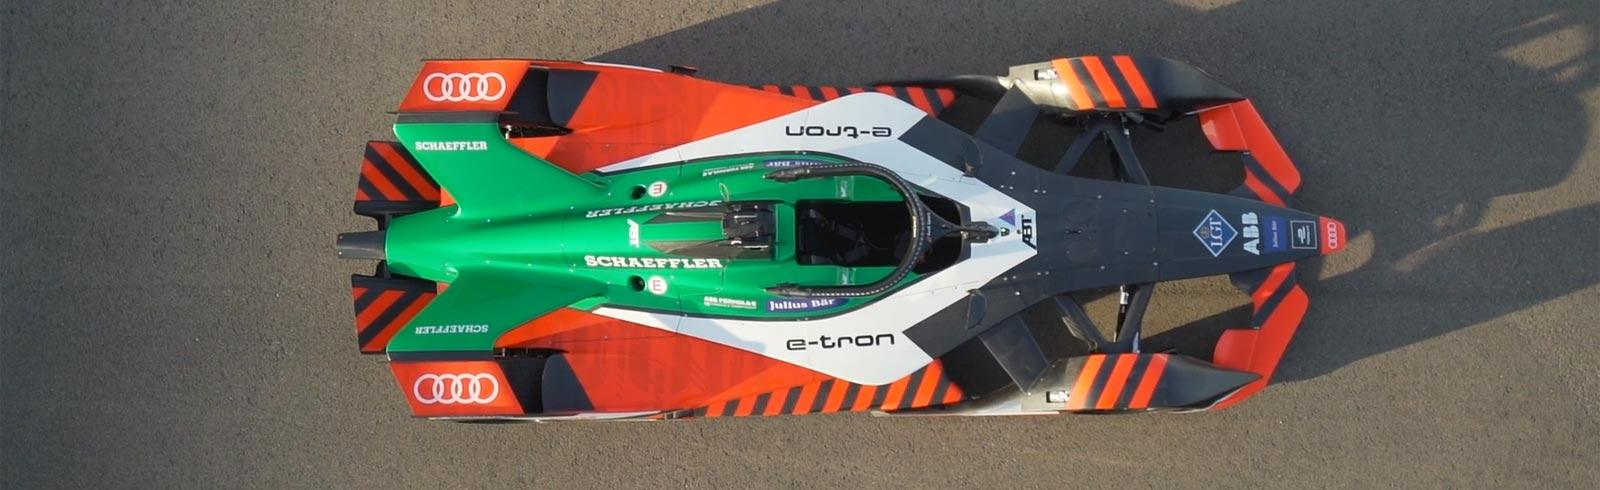 The 2020 Audi e-tron FE06 Formula E racer gets a design overhaul